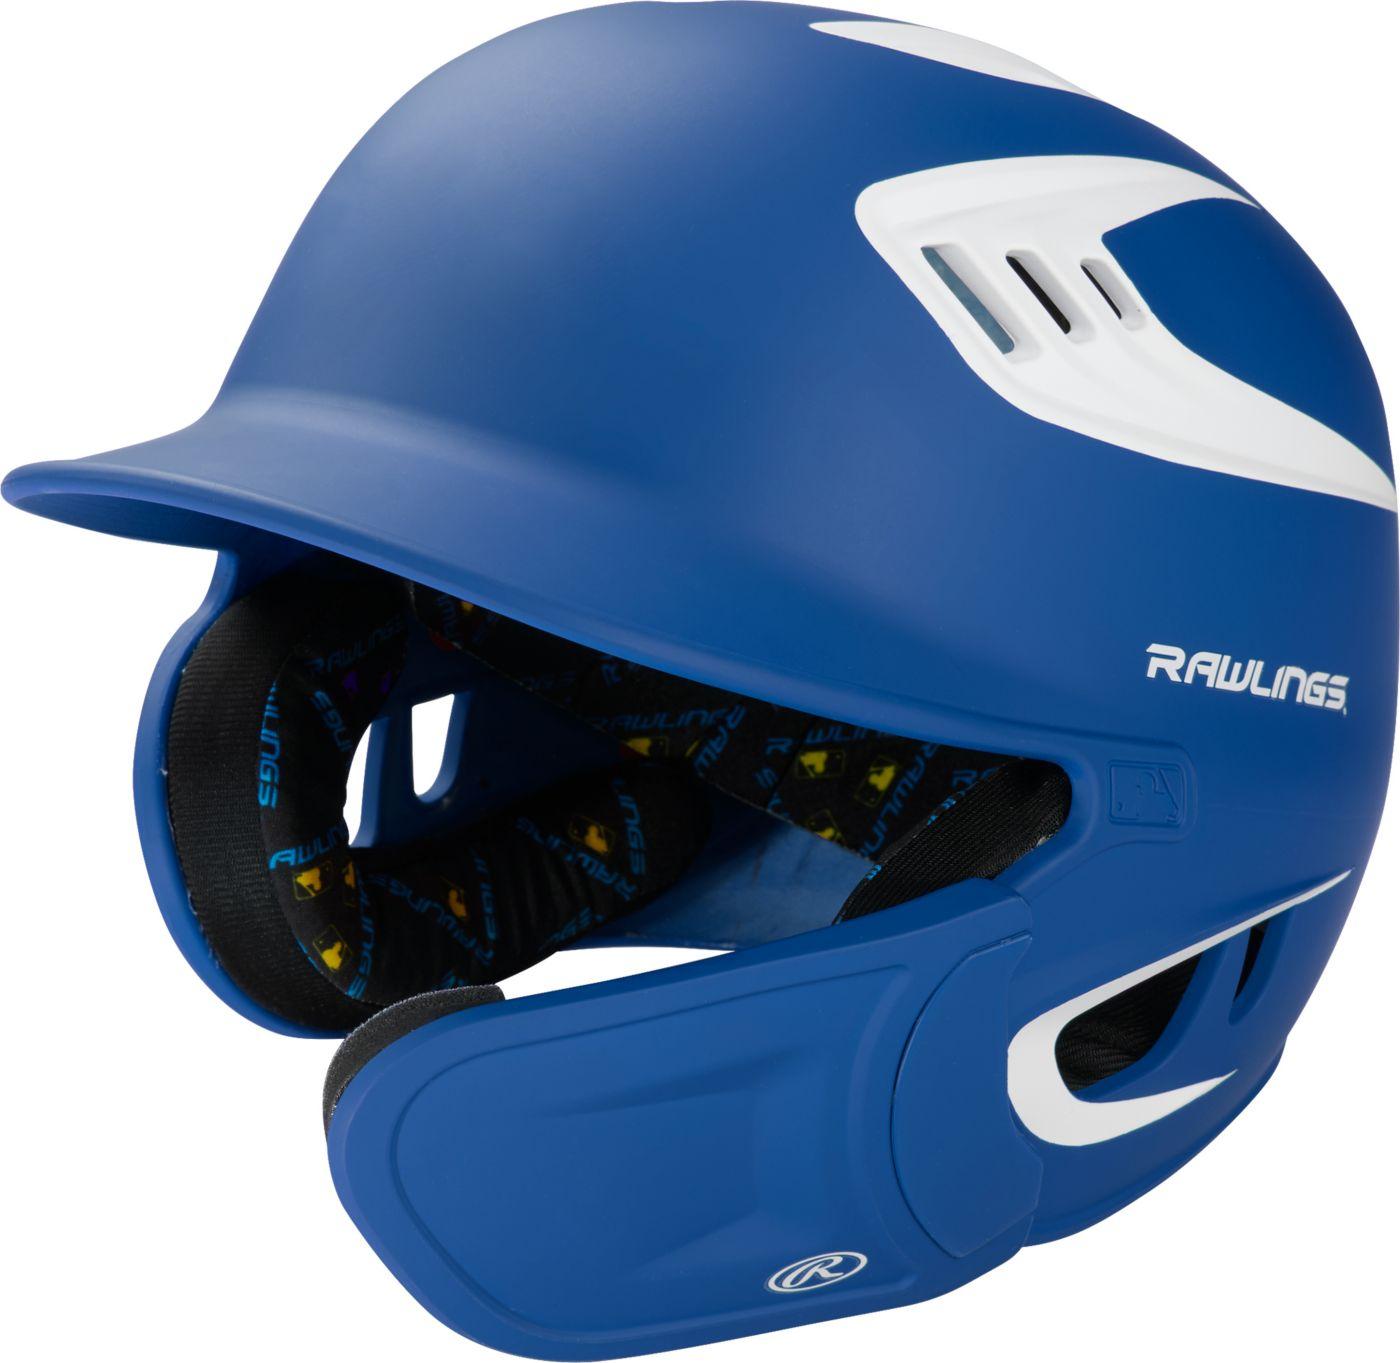 Rawlings Junior VELO Matte Batting Helmet w/ Extended Jaw Guard 1